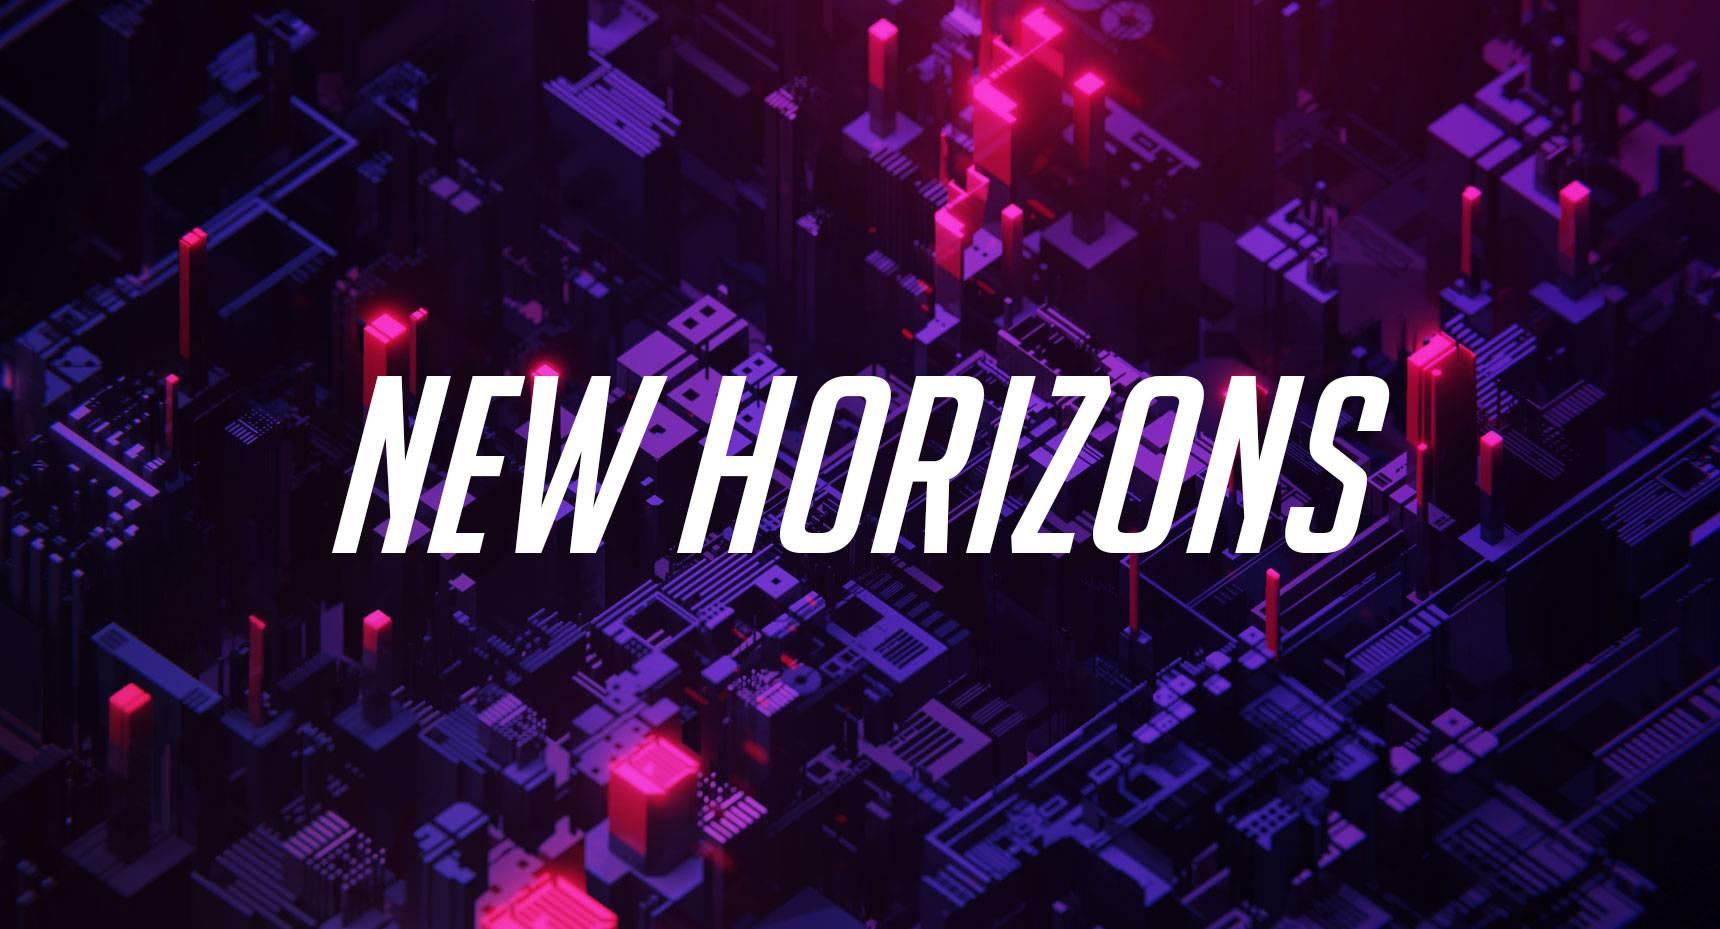 Sc-newhorizons-servizio